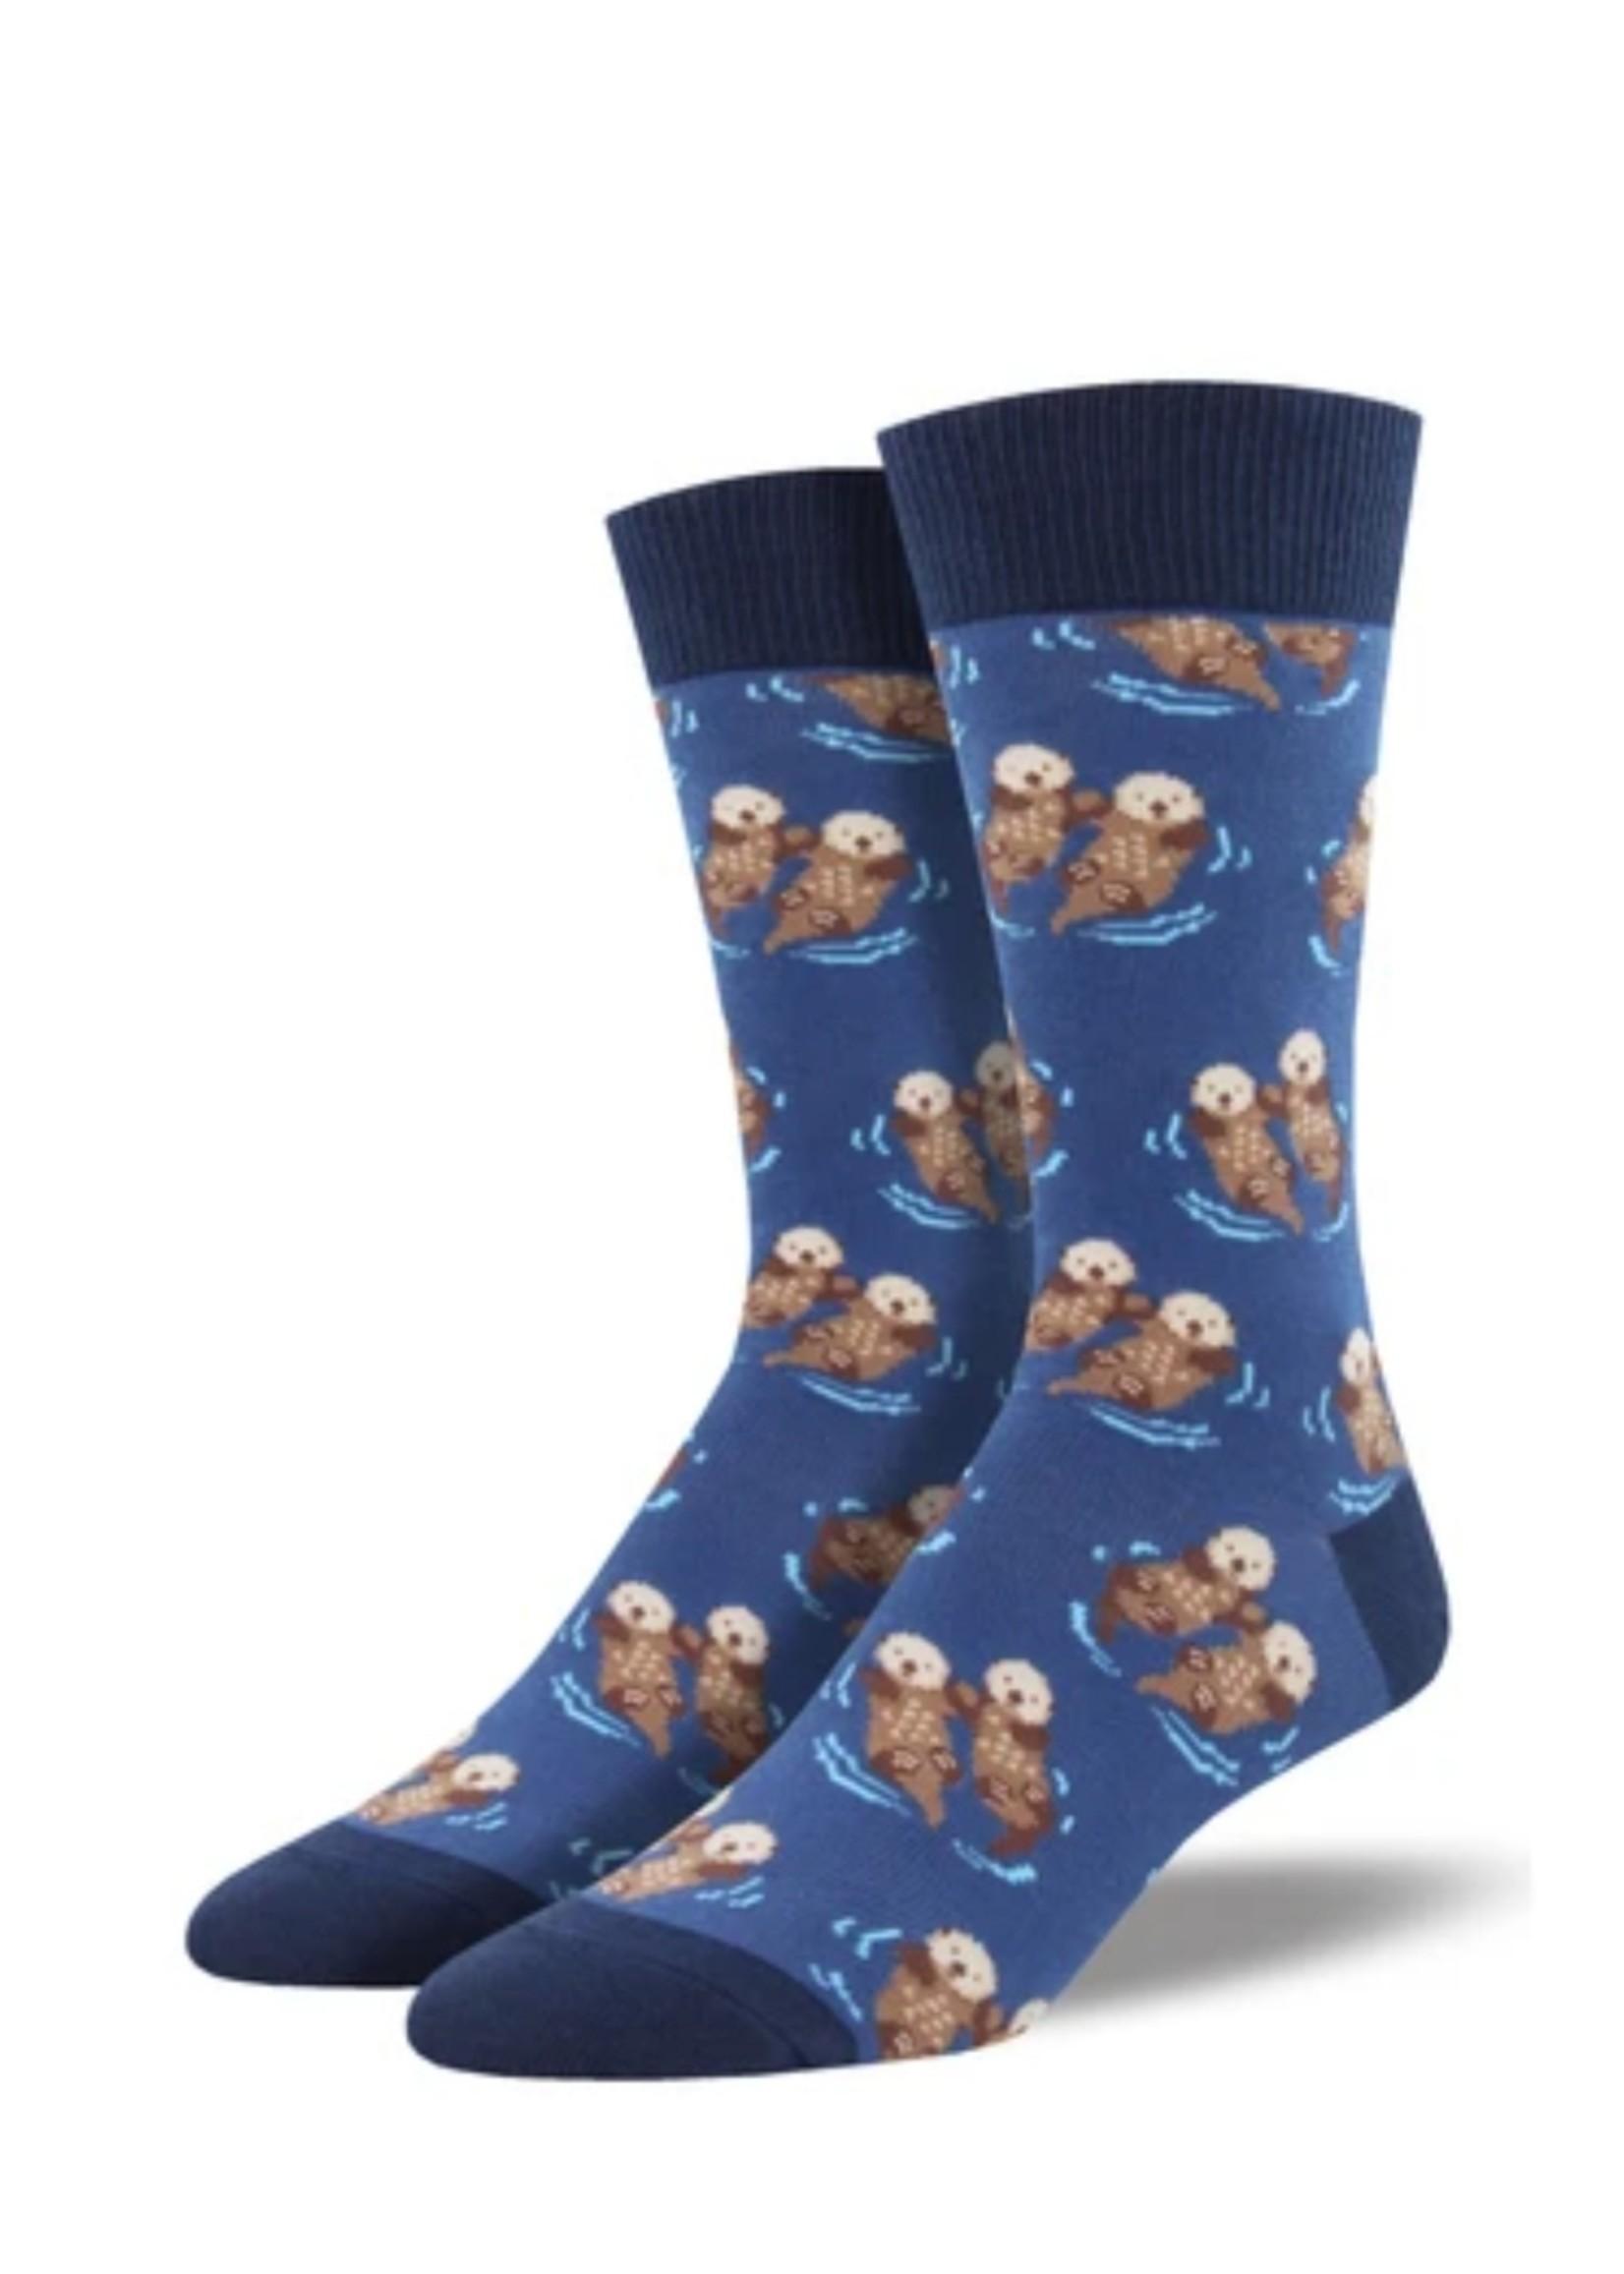 Socksmith Canada Inc MEN'S SIGNIFICANT OTTER SOCKS